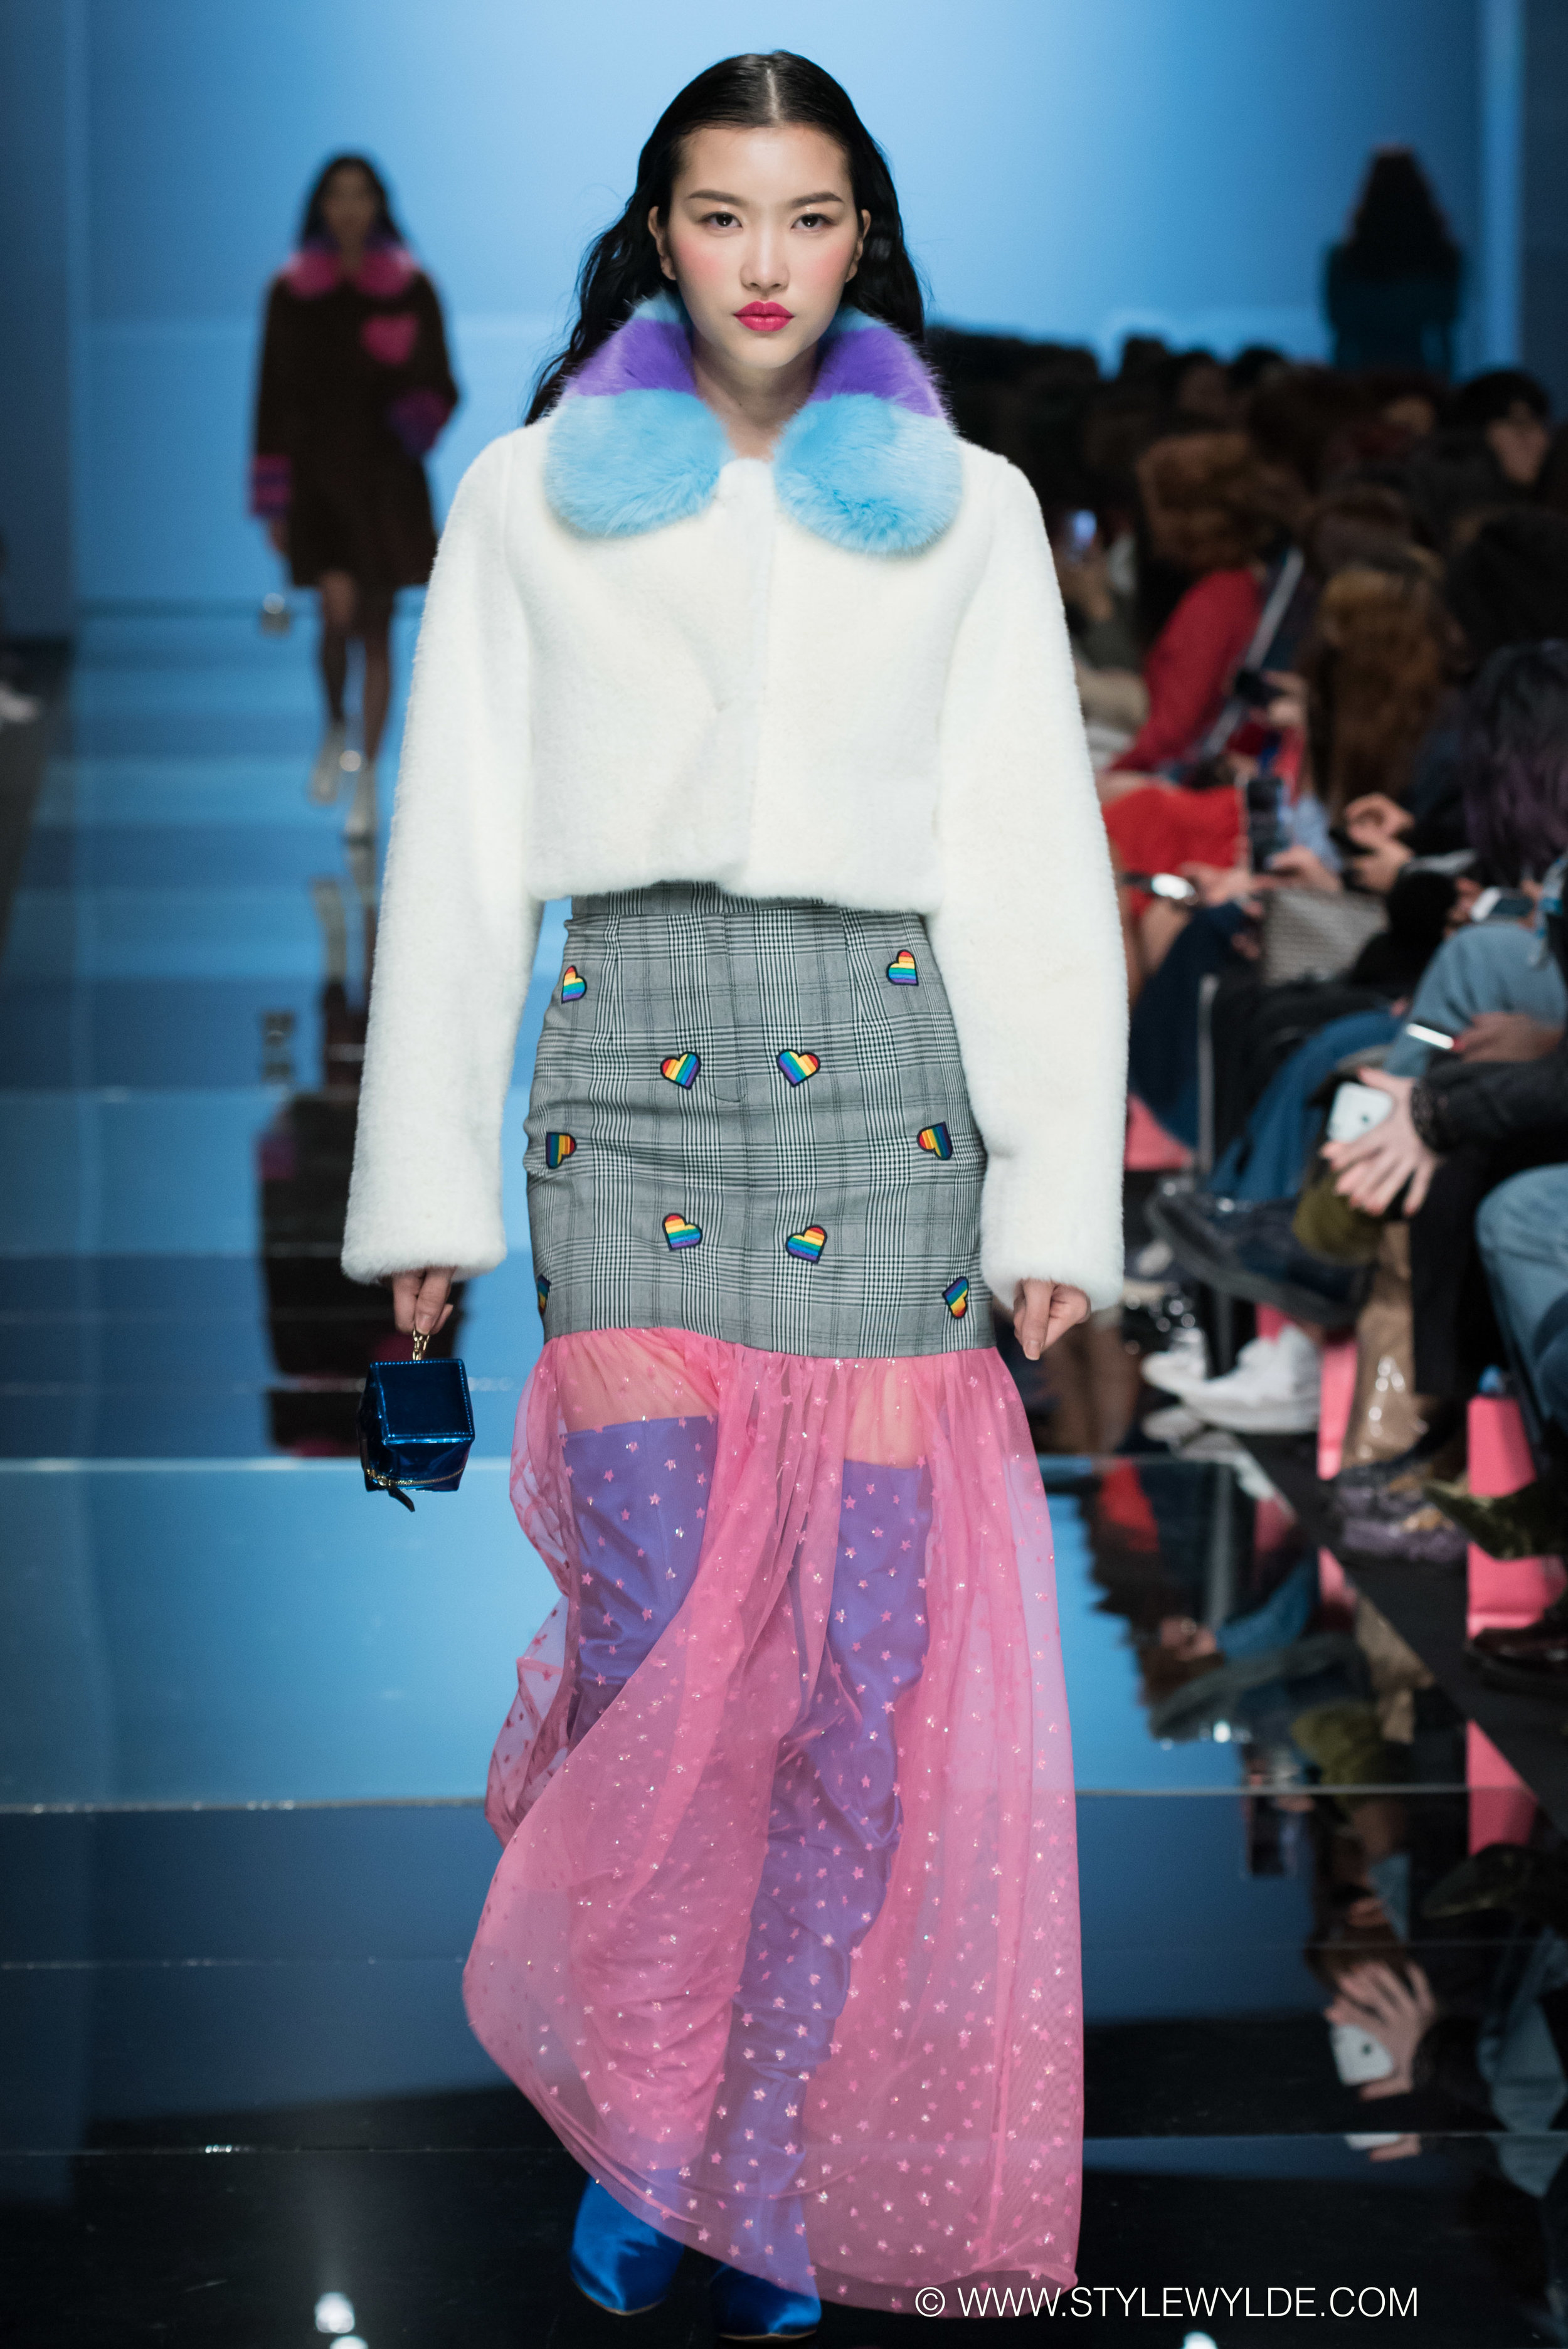 CynthiaHopeAnderson-HeraSeoul FashionWeekAW18-Lang&Lu-24.jpg